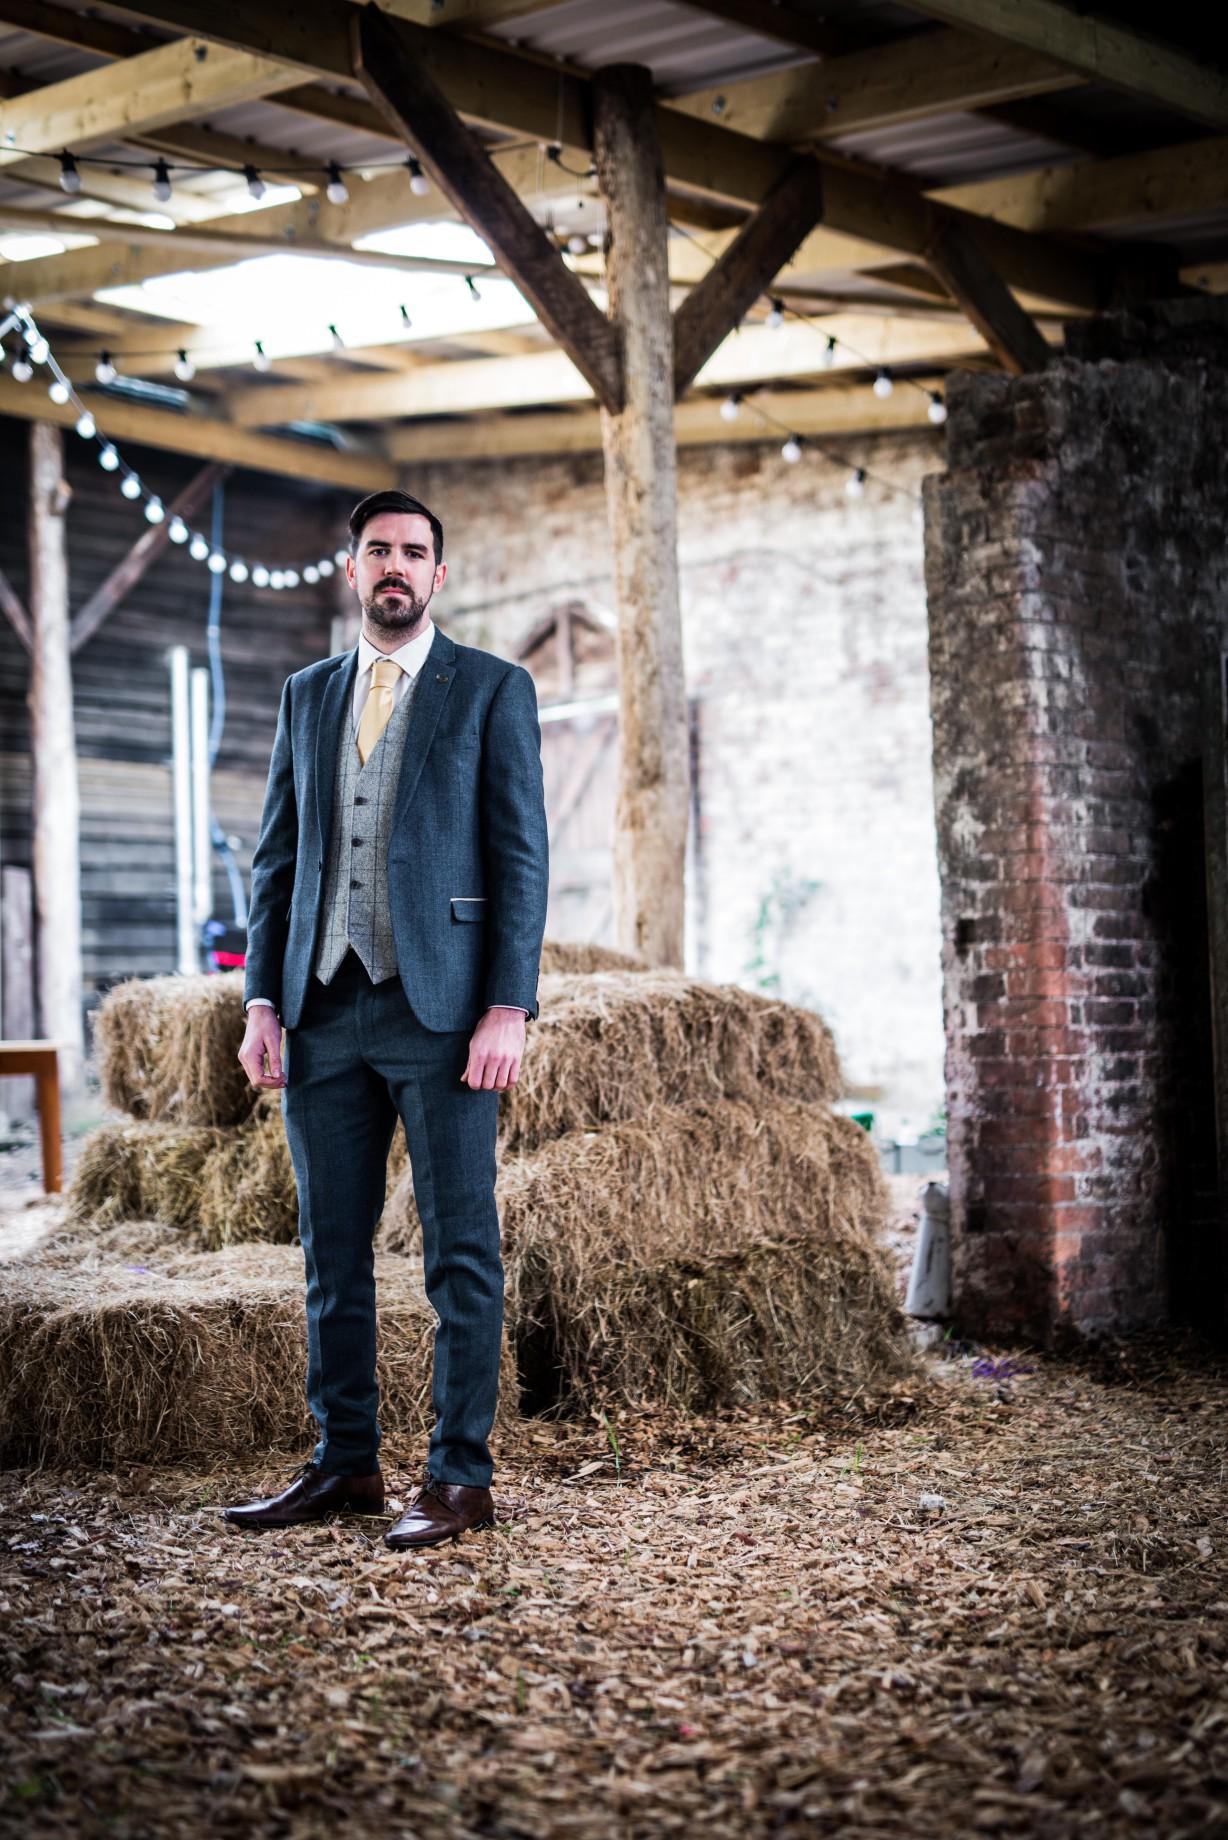 Peacock barns - alternative unconventional wedding photoshoot - rustic decadent - groom - barn